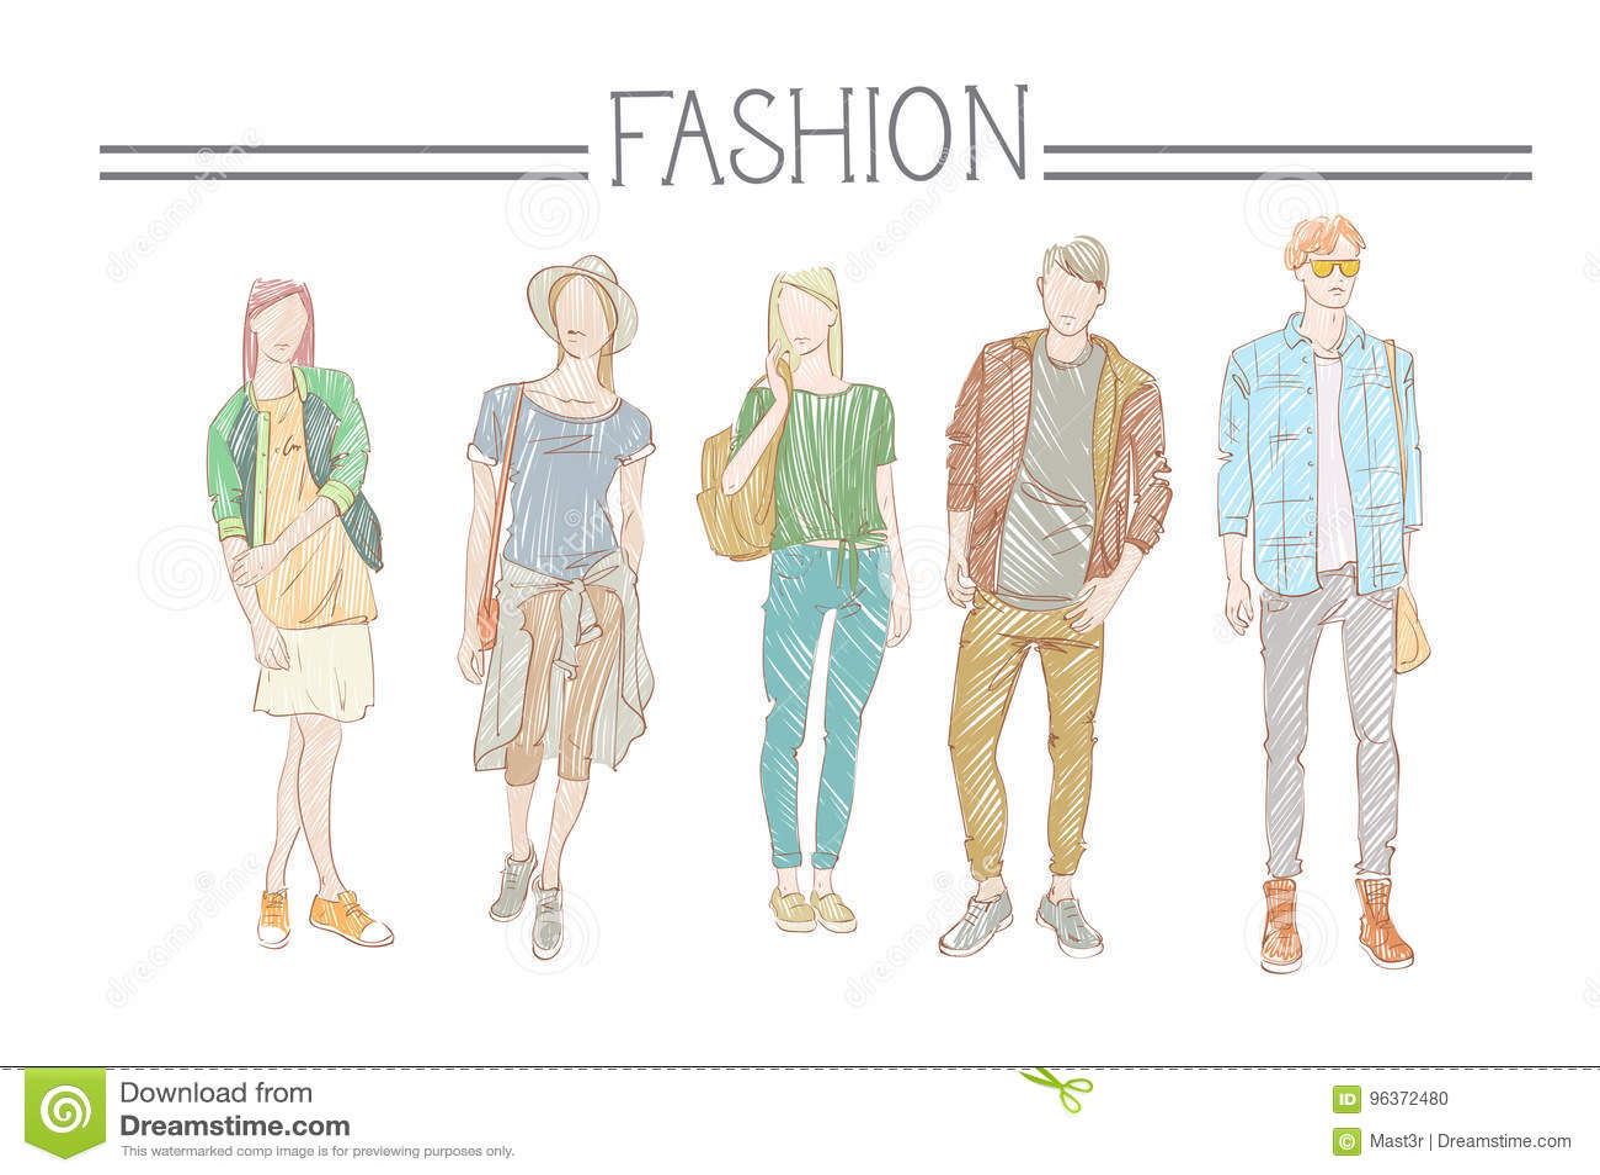 Im japanischen Stil Holzschuhe männliche und weibliche Modelle Paar Holzschuhe der Holz- Hausschuhe Männer Sommer rutschfeste Schuhe Holzschuhe.